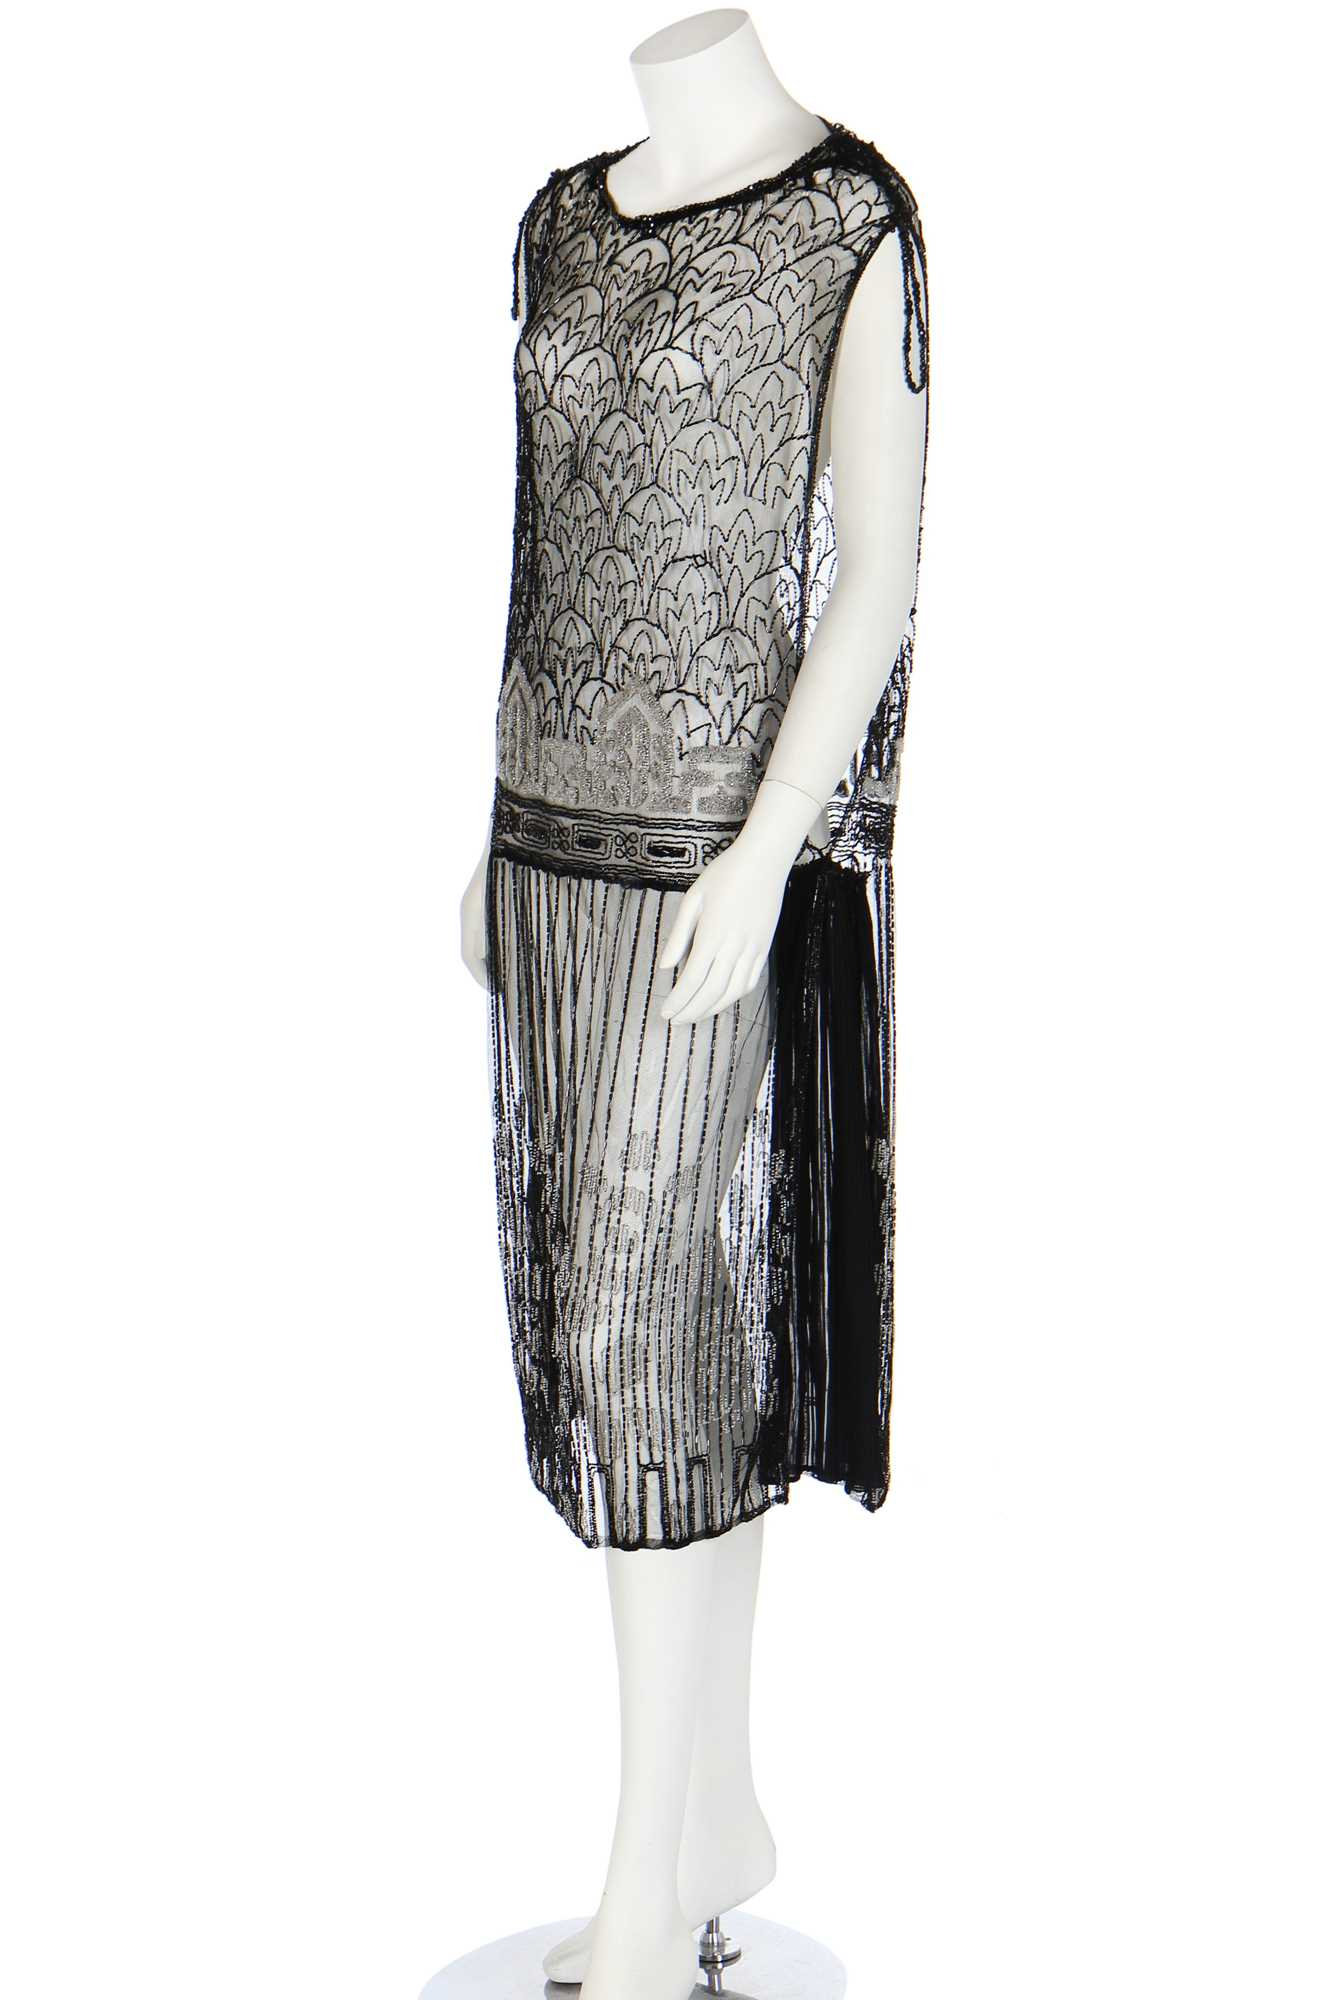 Lot 39 - A trompe l'oeil beaded black muslin bodice, 1920s